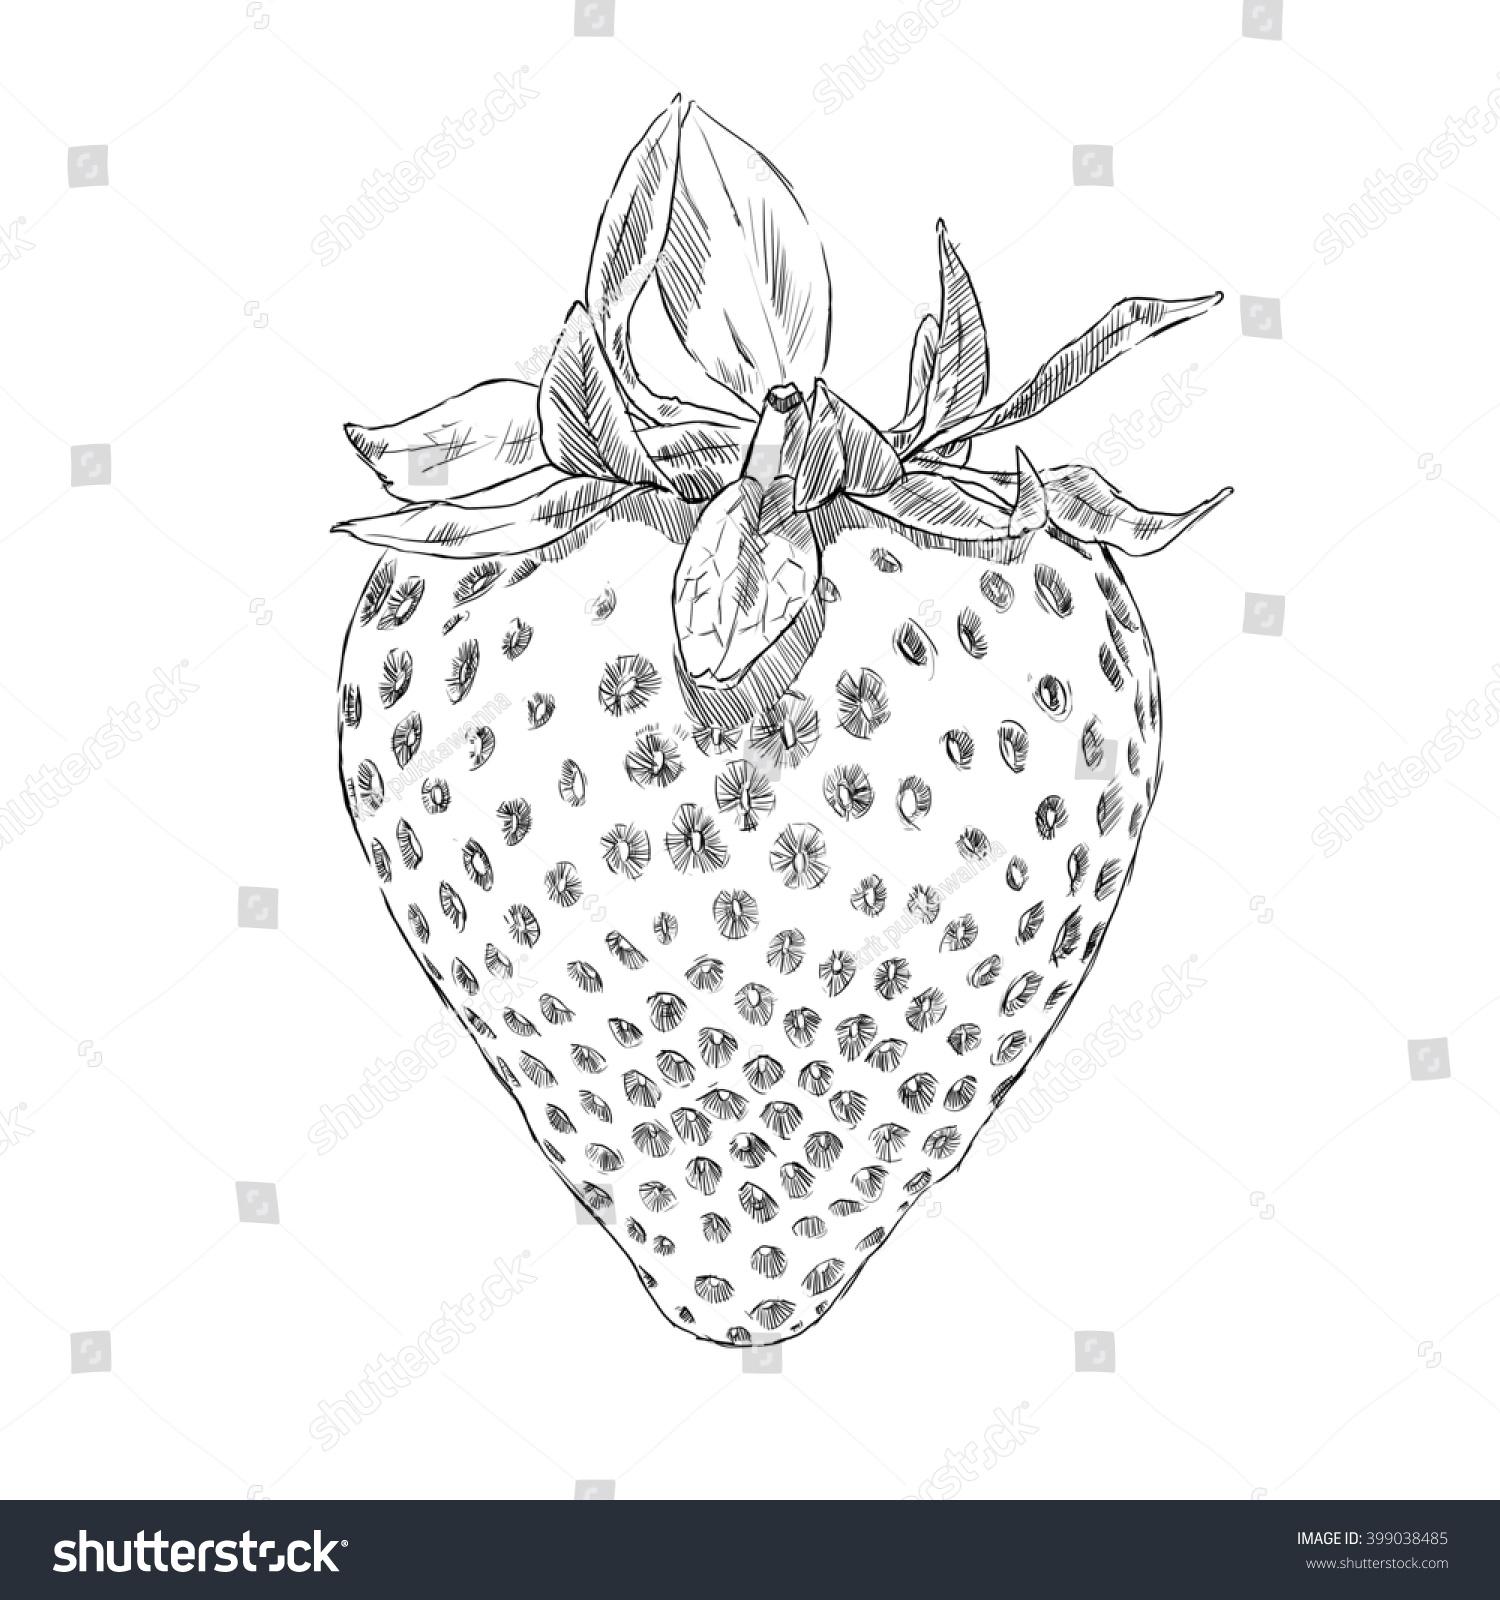 Uncategorized Drawing Of Strawberry drawing strawberry design stock illustration 399038485 shutterstock design